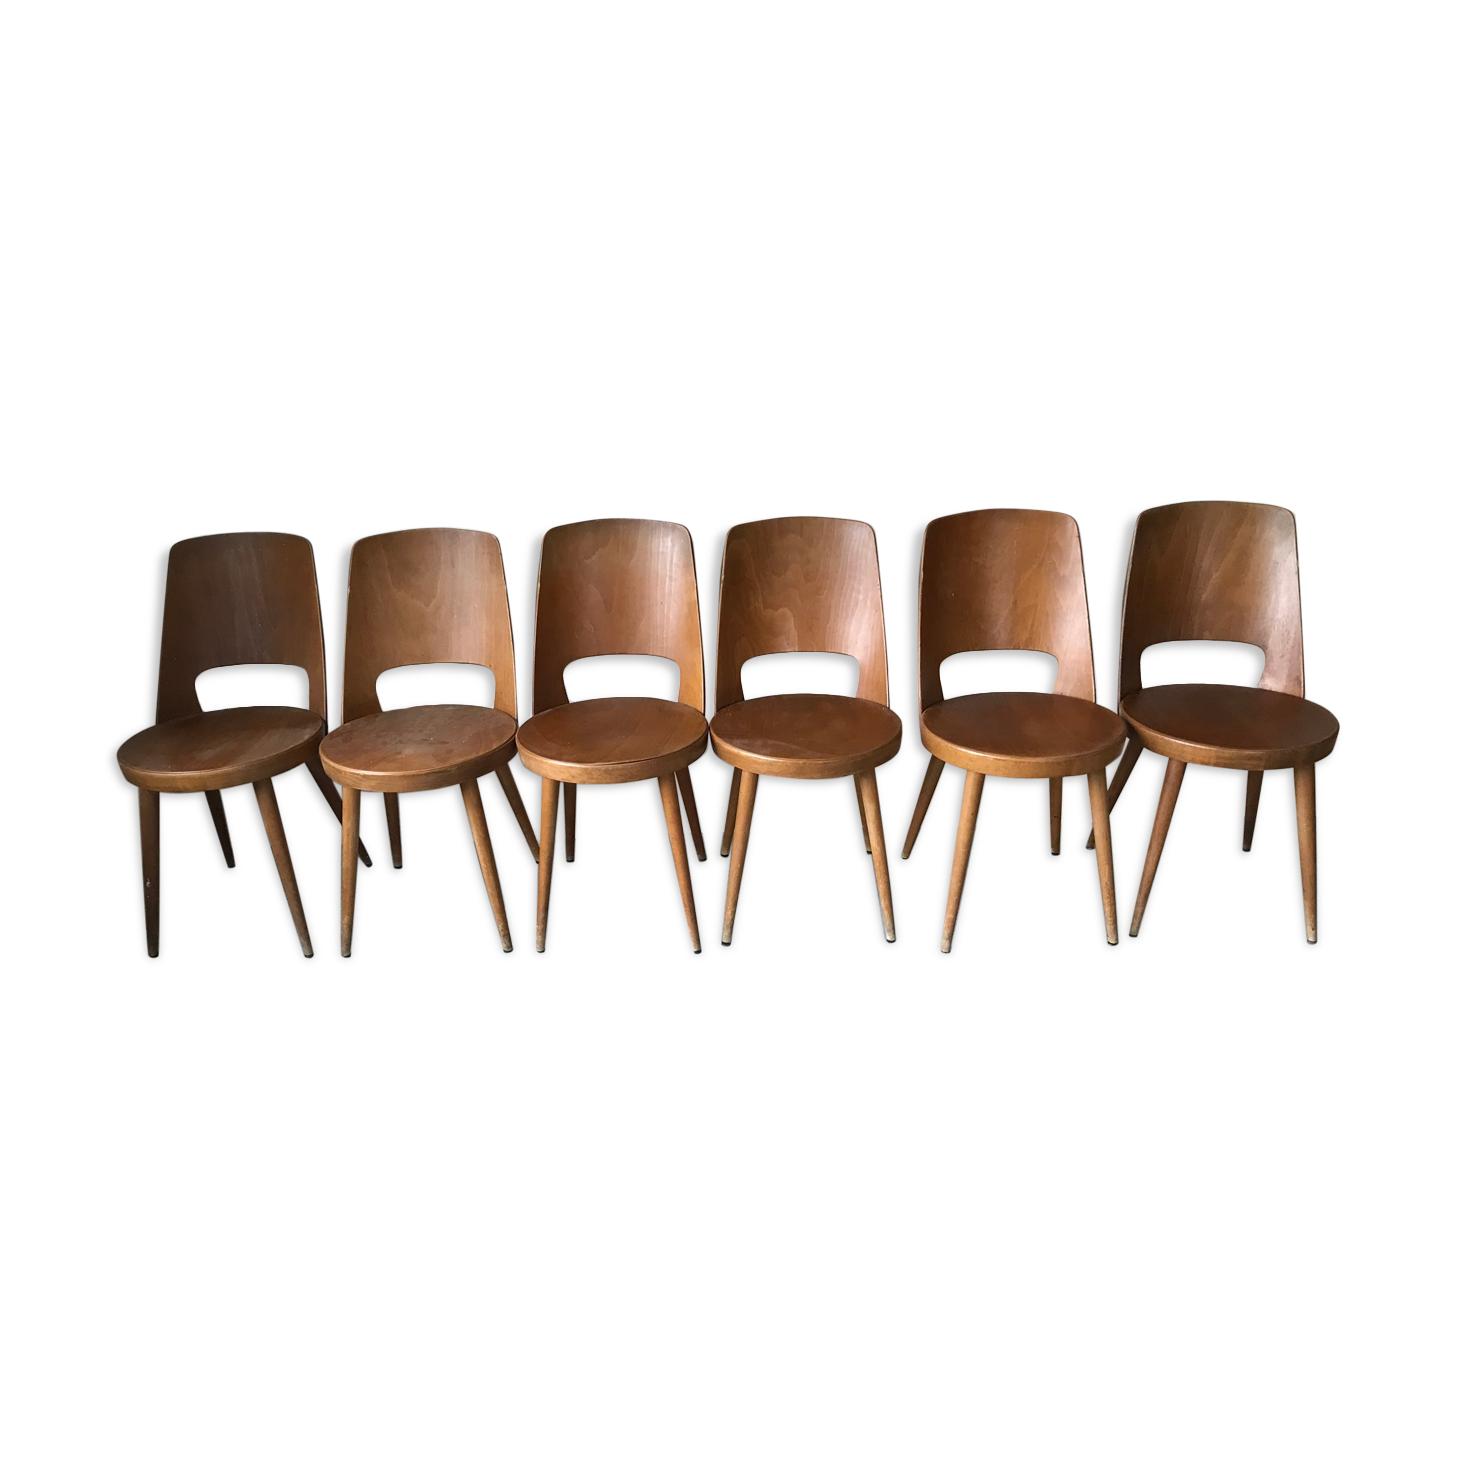 Suite de 6 chaises bistrot Baumann circa 1950